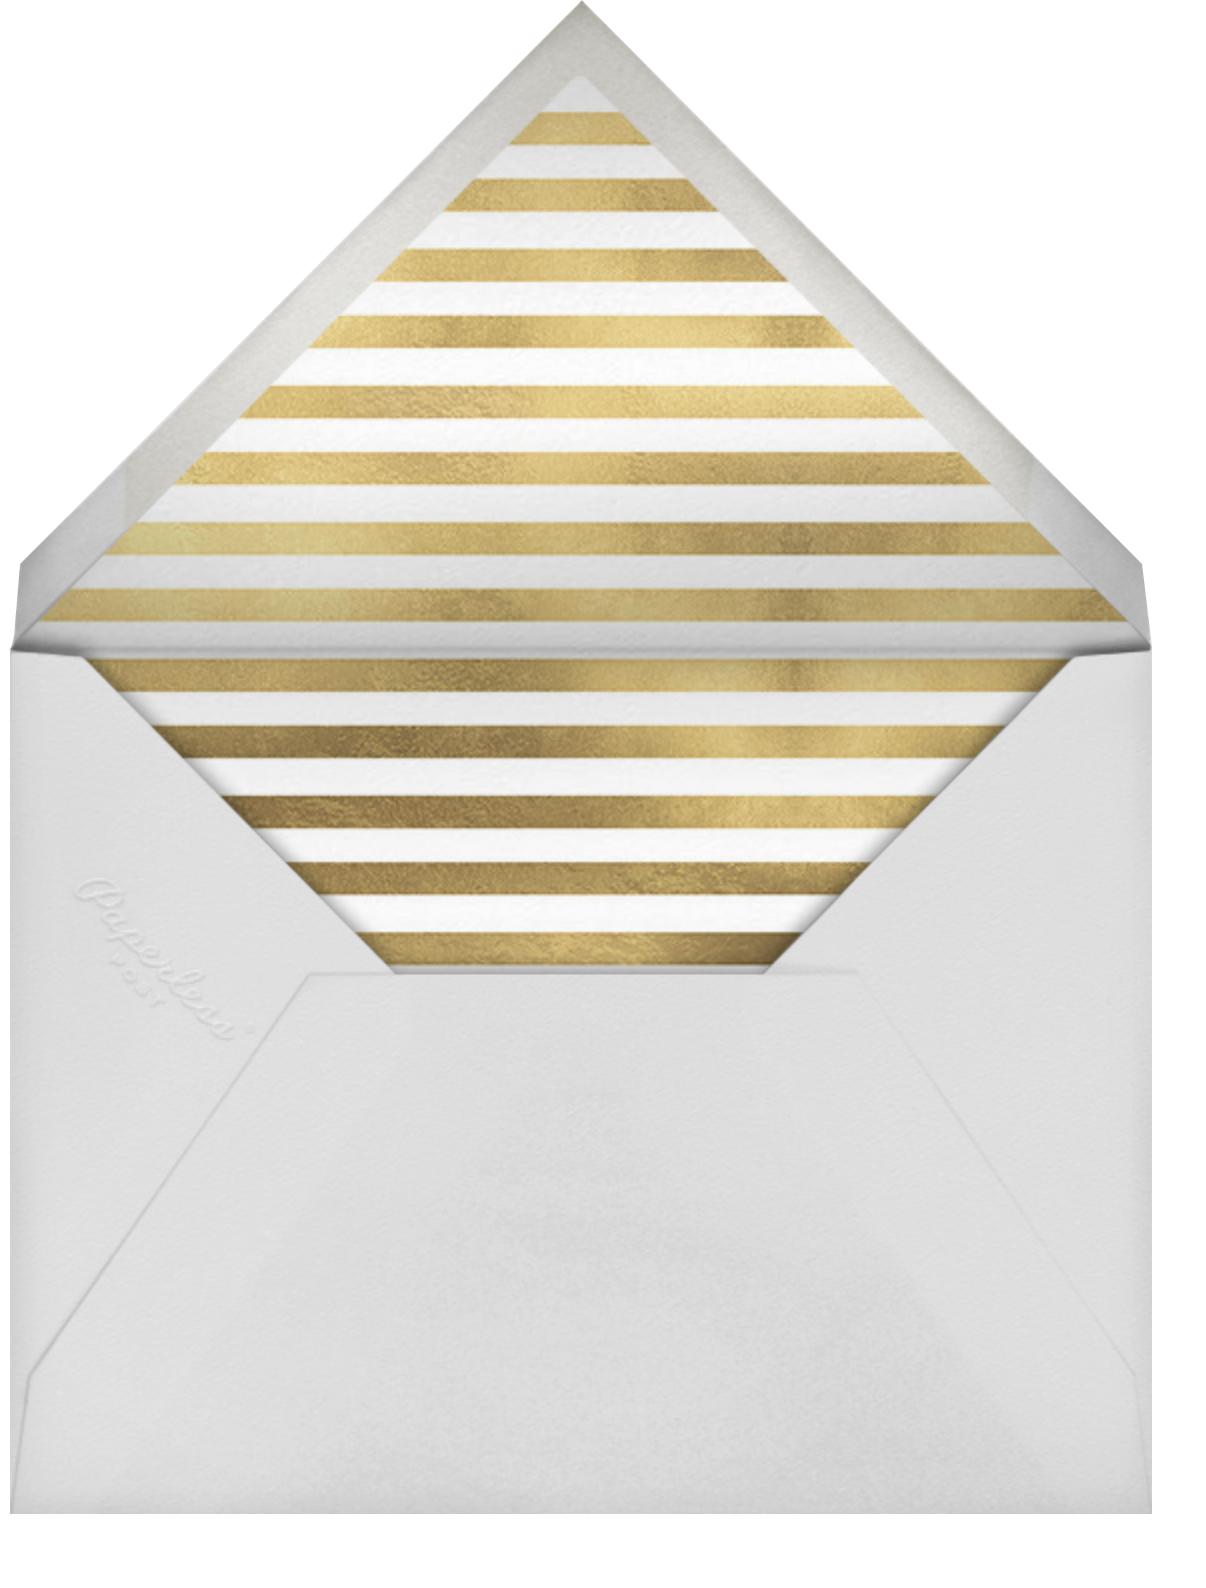 Tassel (Photo) - Gray - kate spade new york - Graduation cards - envelope back